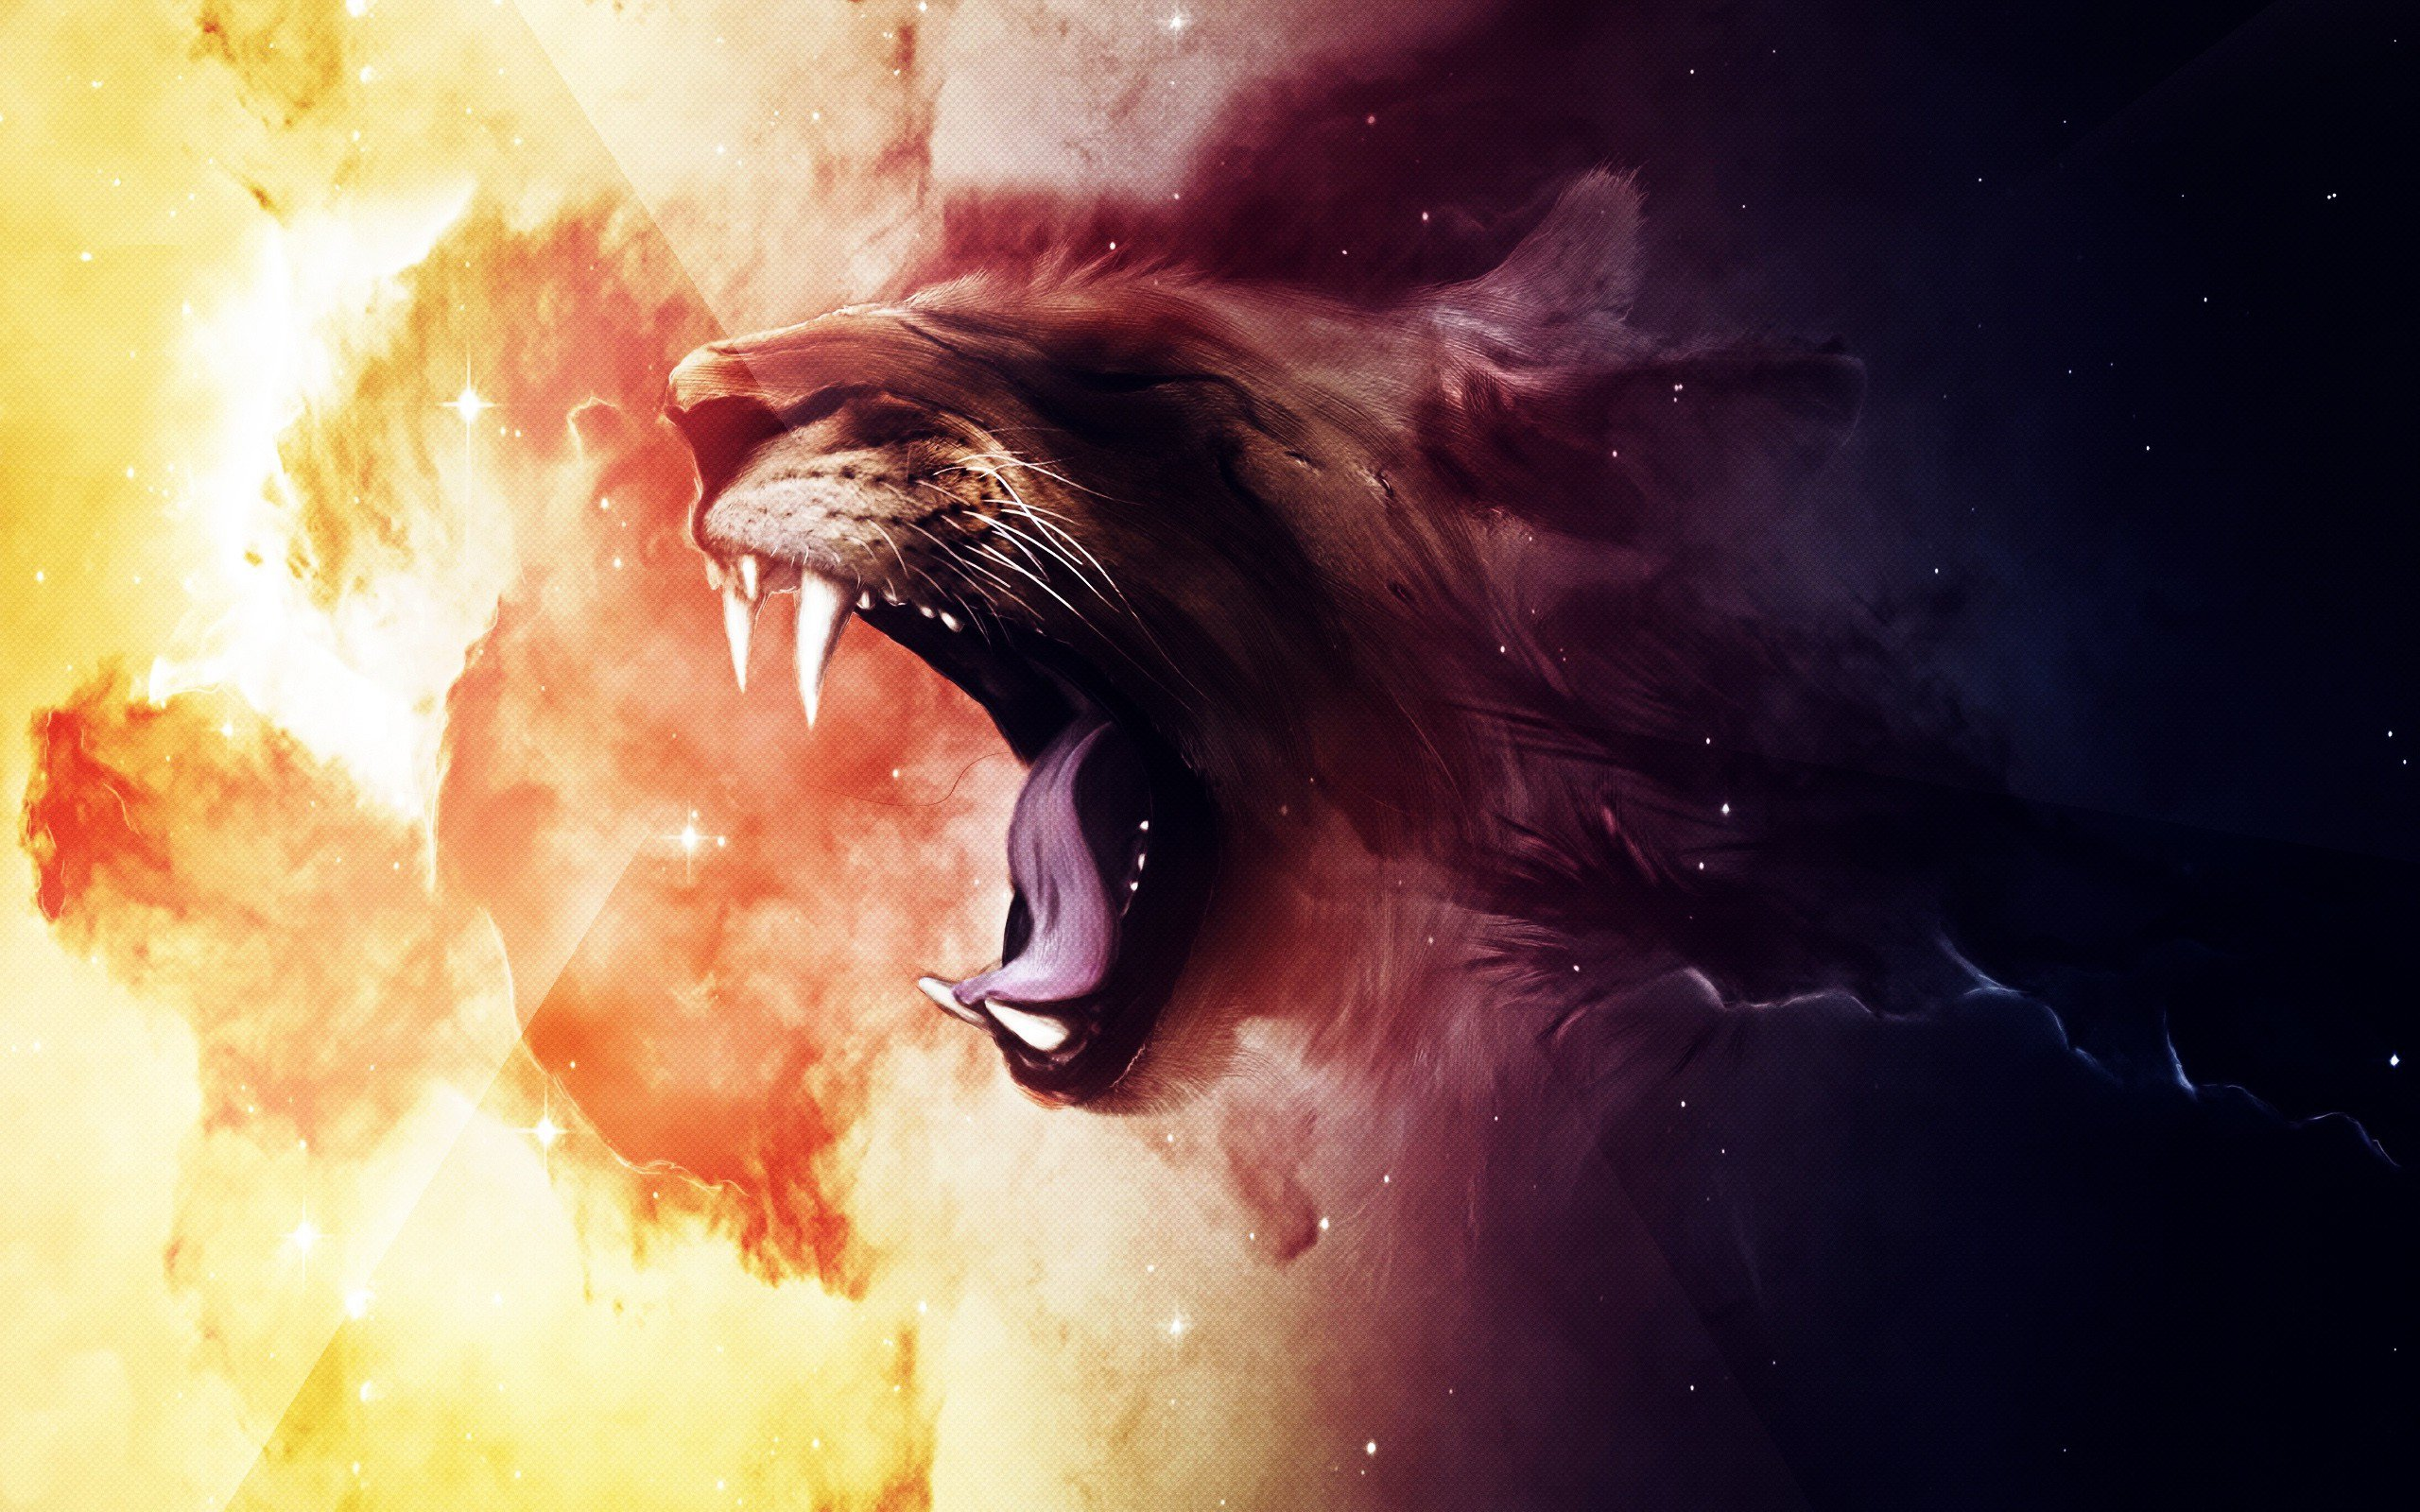 Lion Roaring Wallpaper Widescreen Download